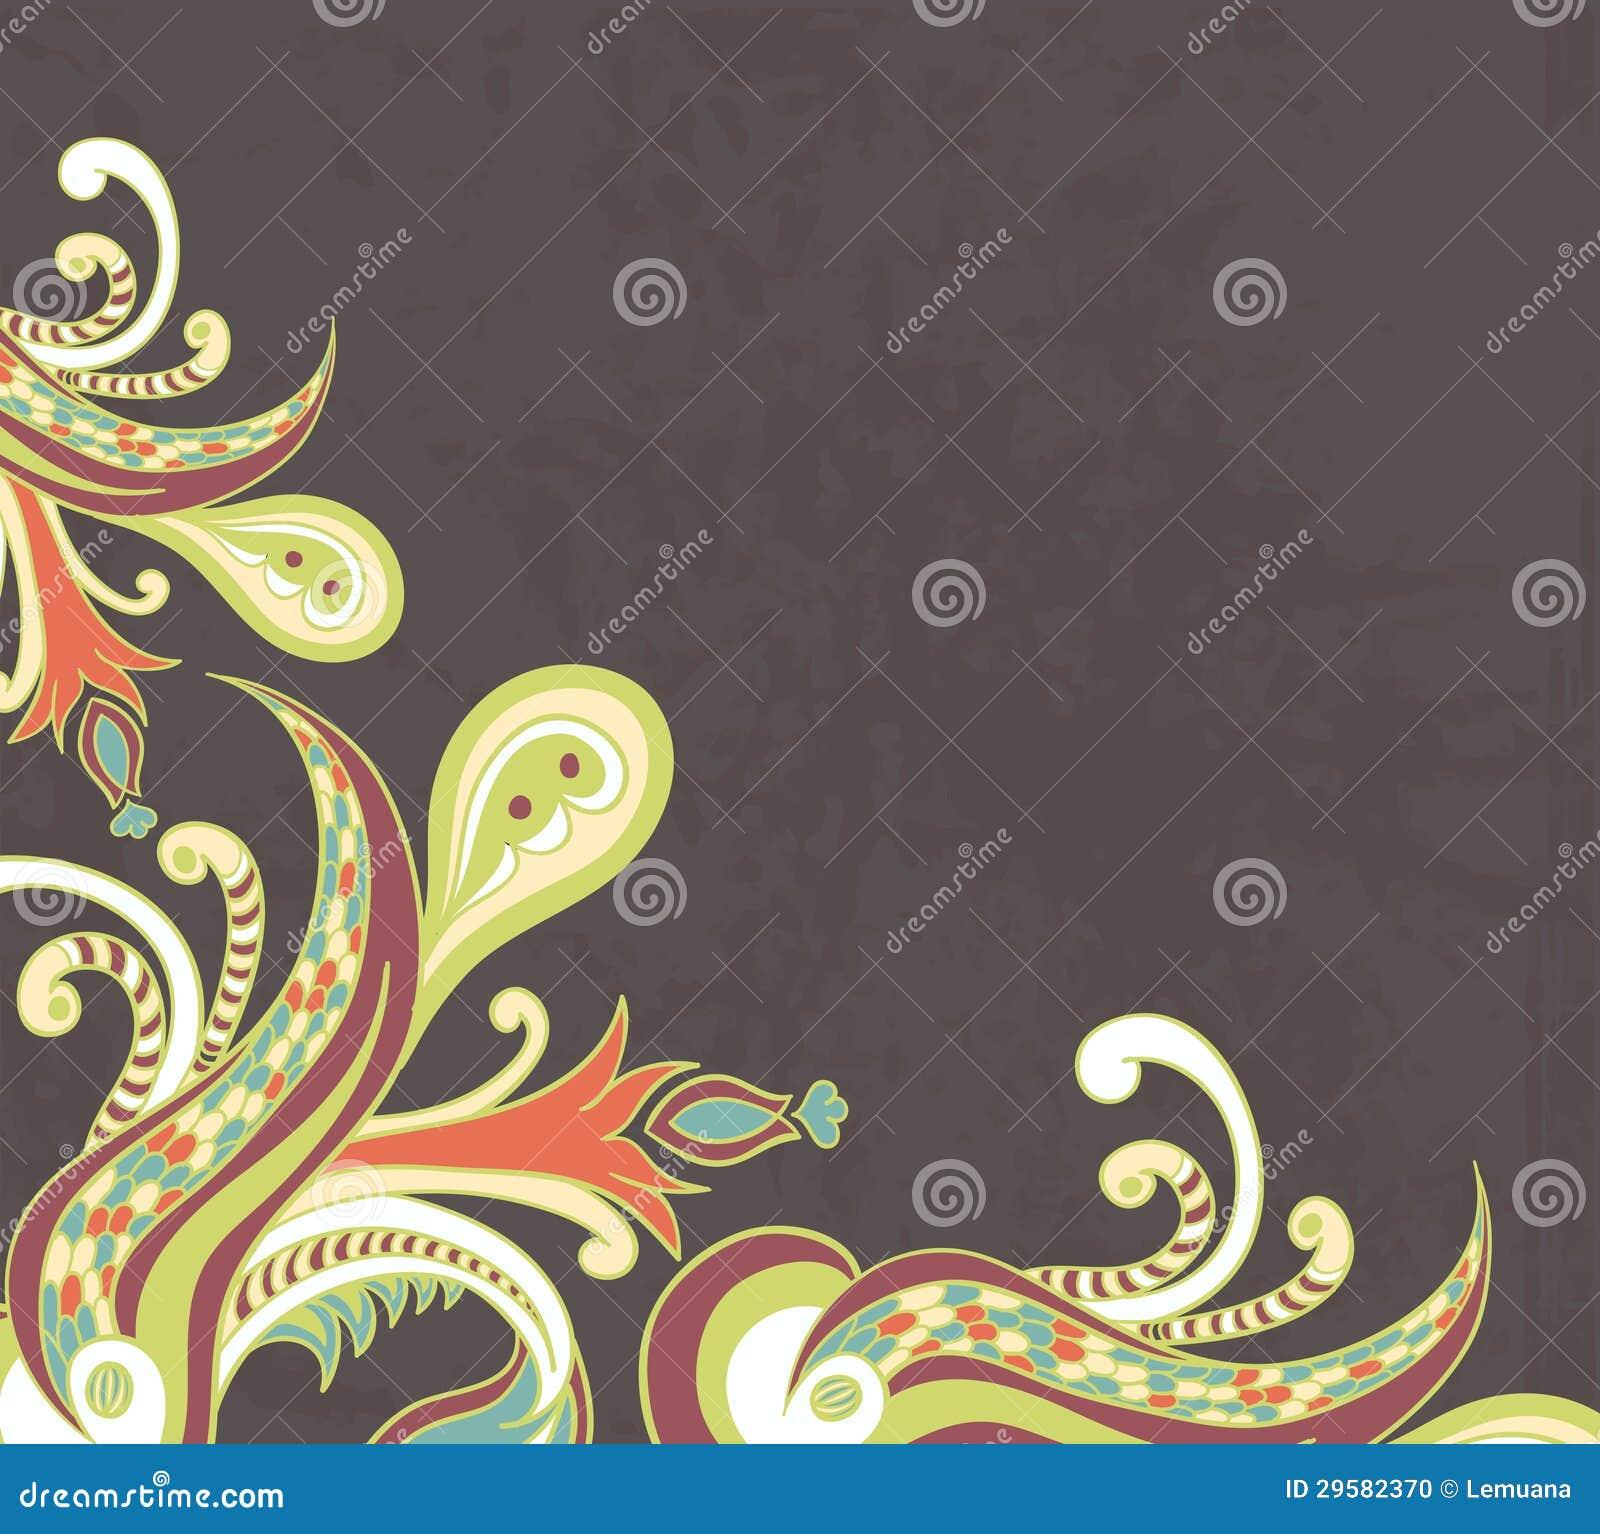 Stylised Flowers On Grunge Background Stock Vector ...